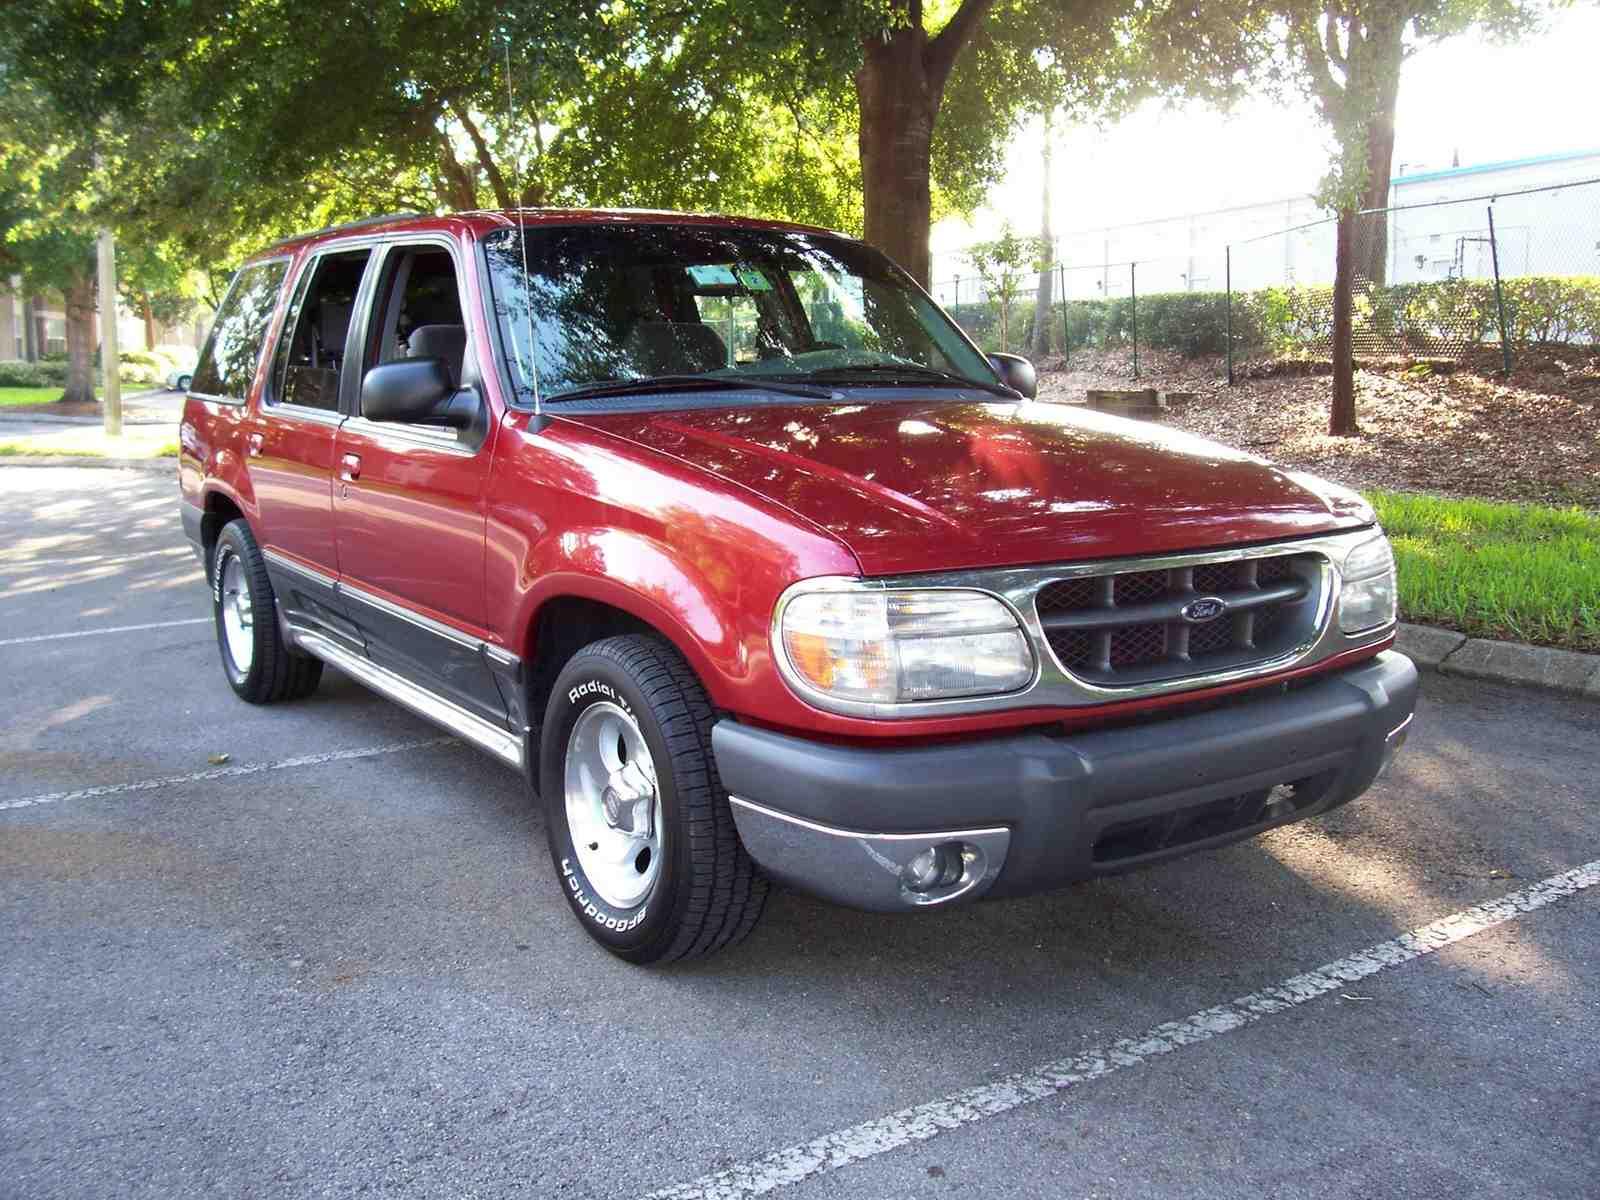 Durango Vs Grand Cherokee >> 2000-2004 Ford Vehicles (ALL MODELS) Workshop Repair & Service Manual (5.7GB DVD Image ...